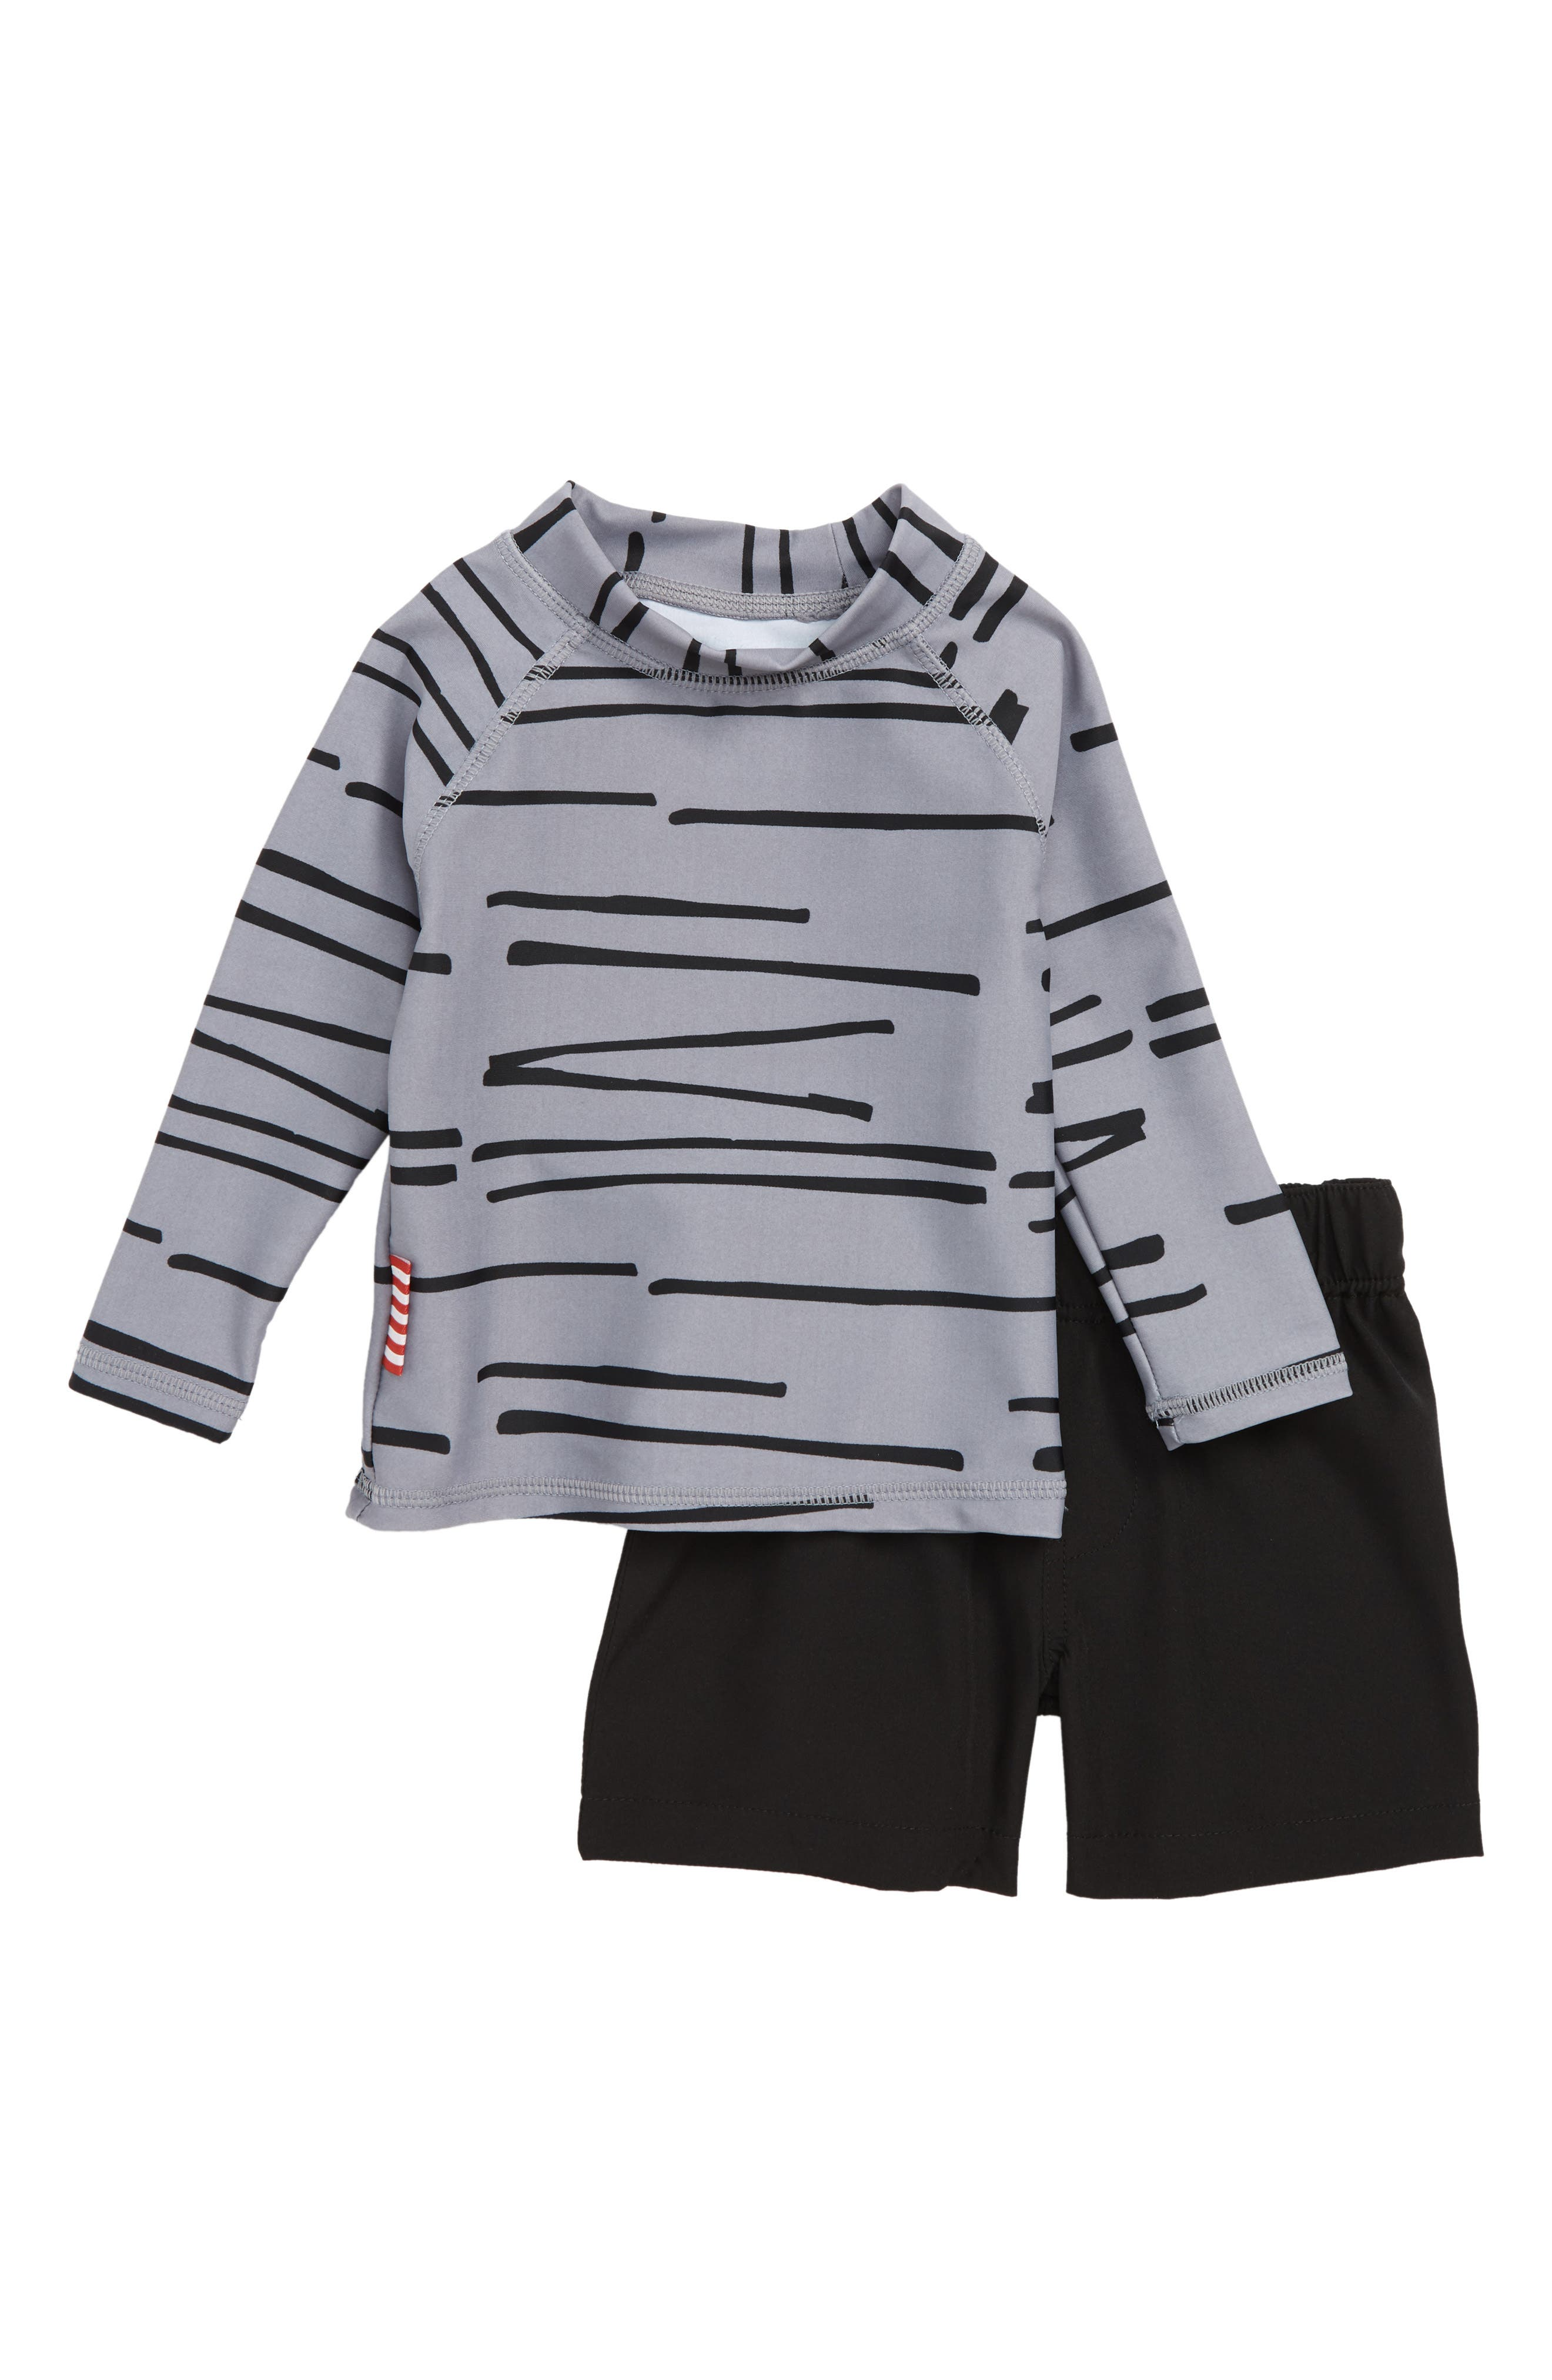 Tiger Stripe Rashguard & Board Shorts Set,                         Main,                         color, 035